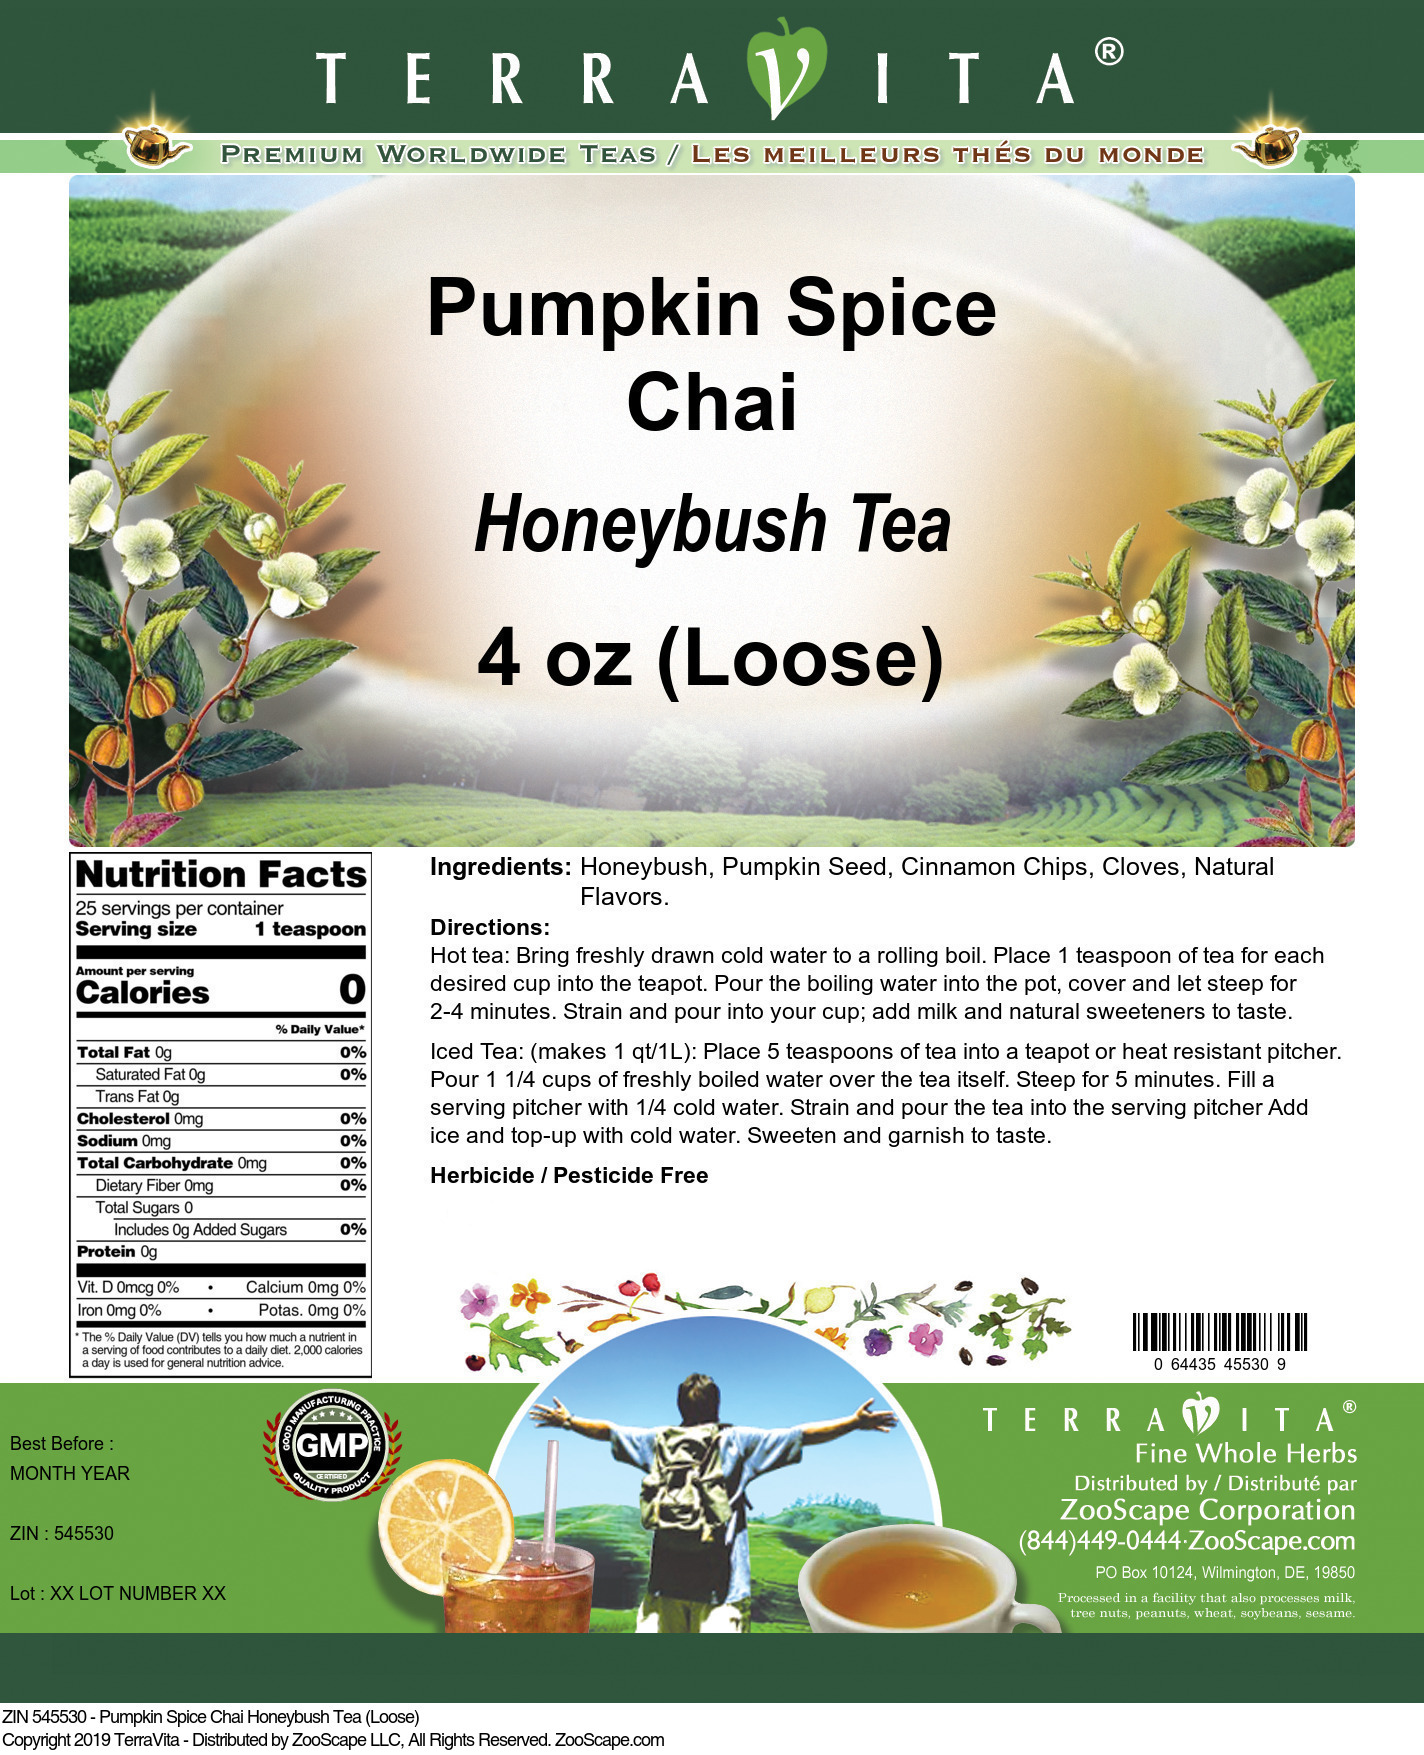 Pumpkin Spice Chai Honeybush Tea (Loose)